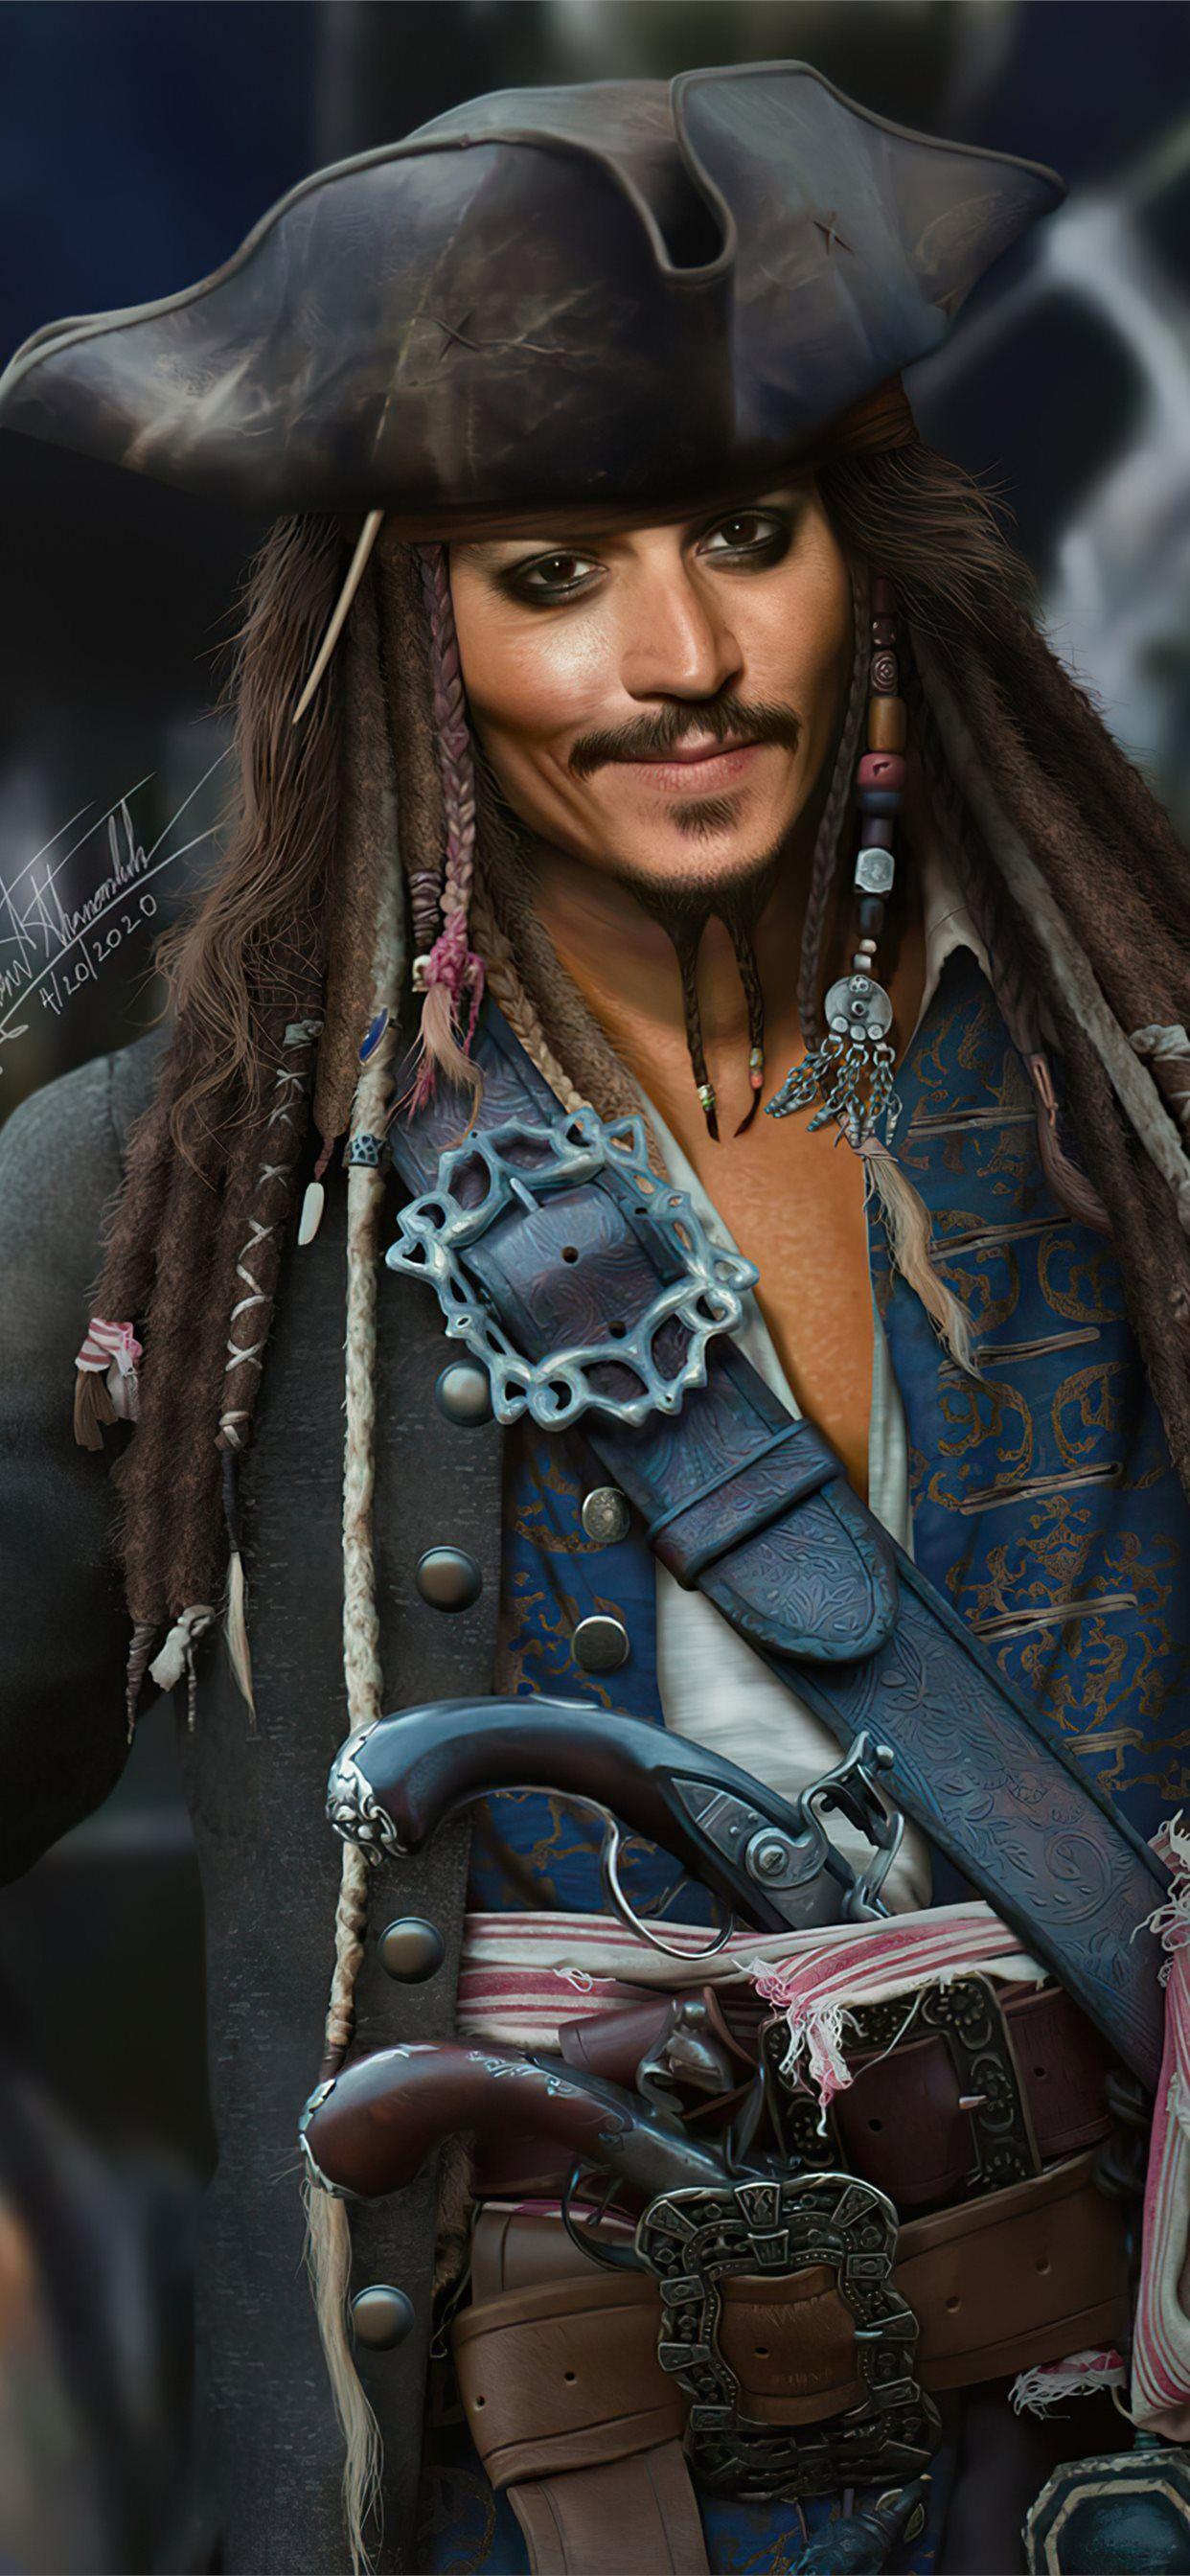 Jack Sparrow Fanart 4k Iphone X Wallpapers Free Download Jack Sparrow Wallpaper Jack Sparrow Jack Sparrow Tattoos